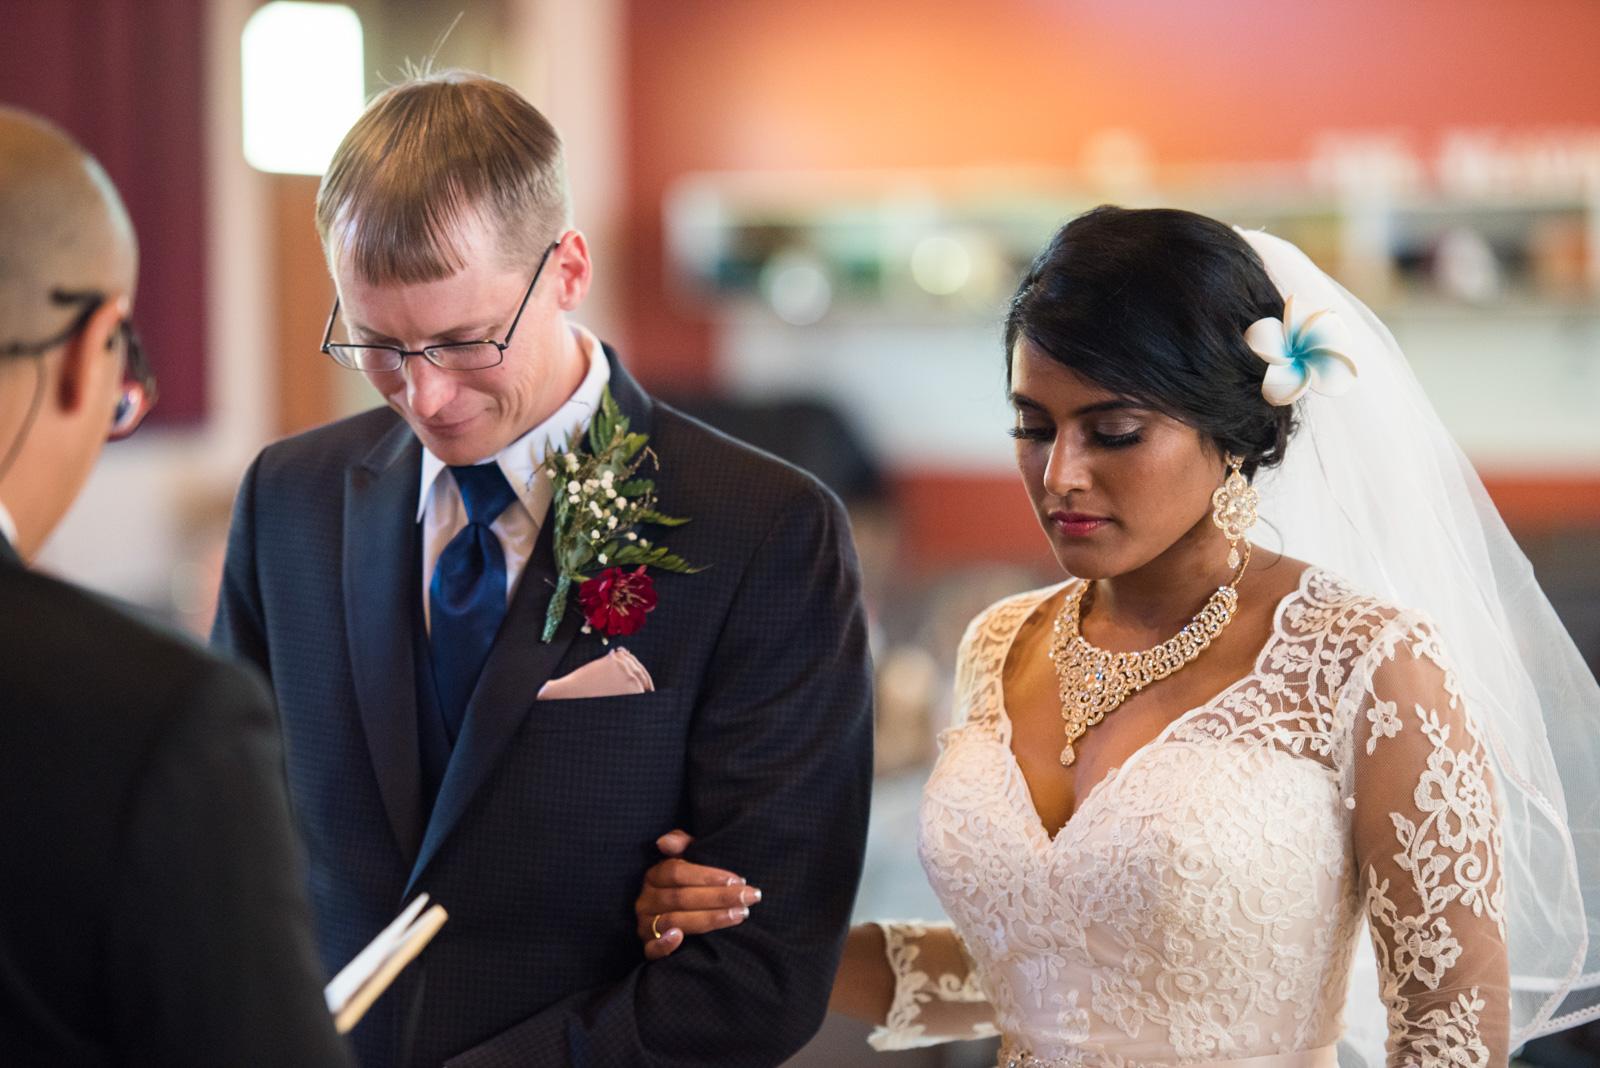 bc-wedding-photographers-paradise-banquet-hall-wedding-15.jpg